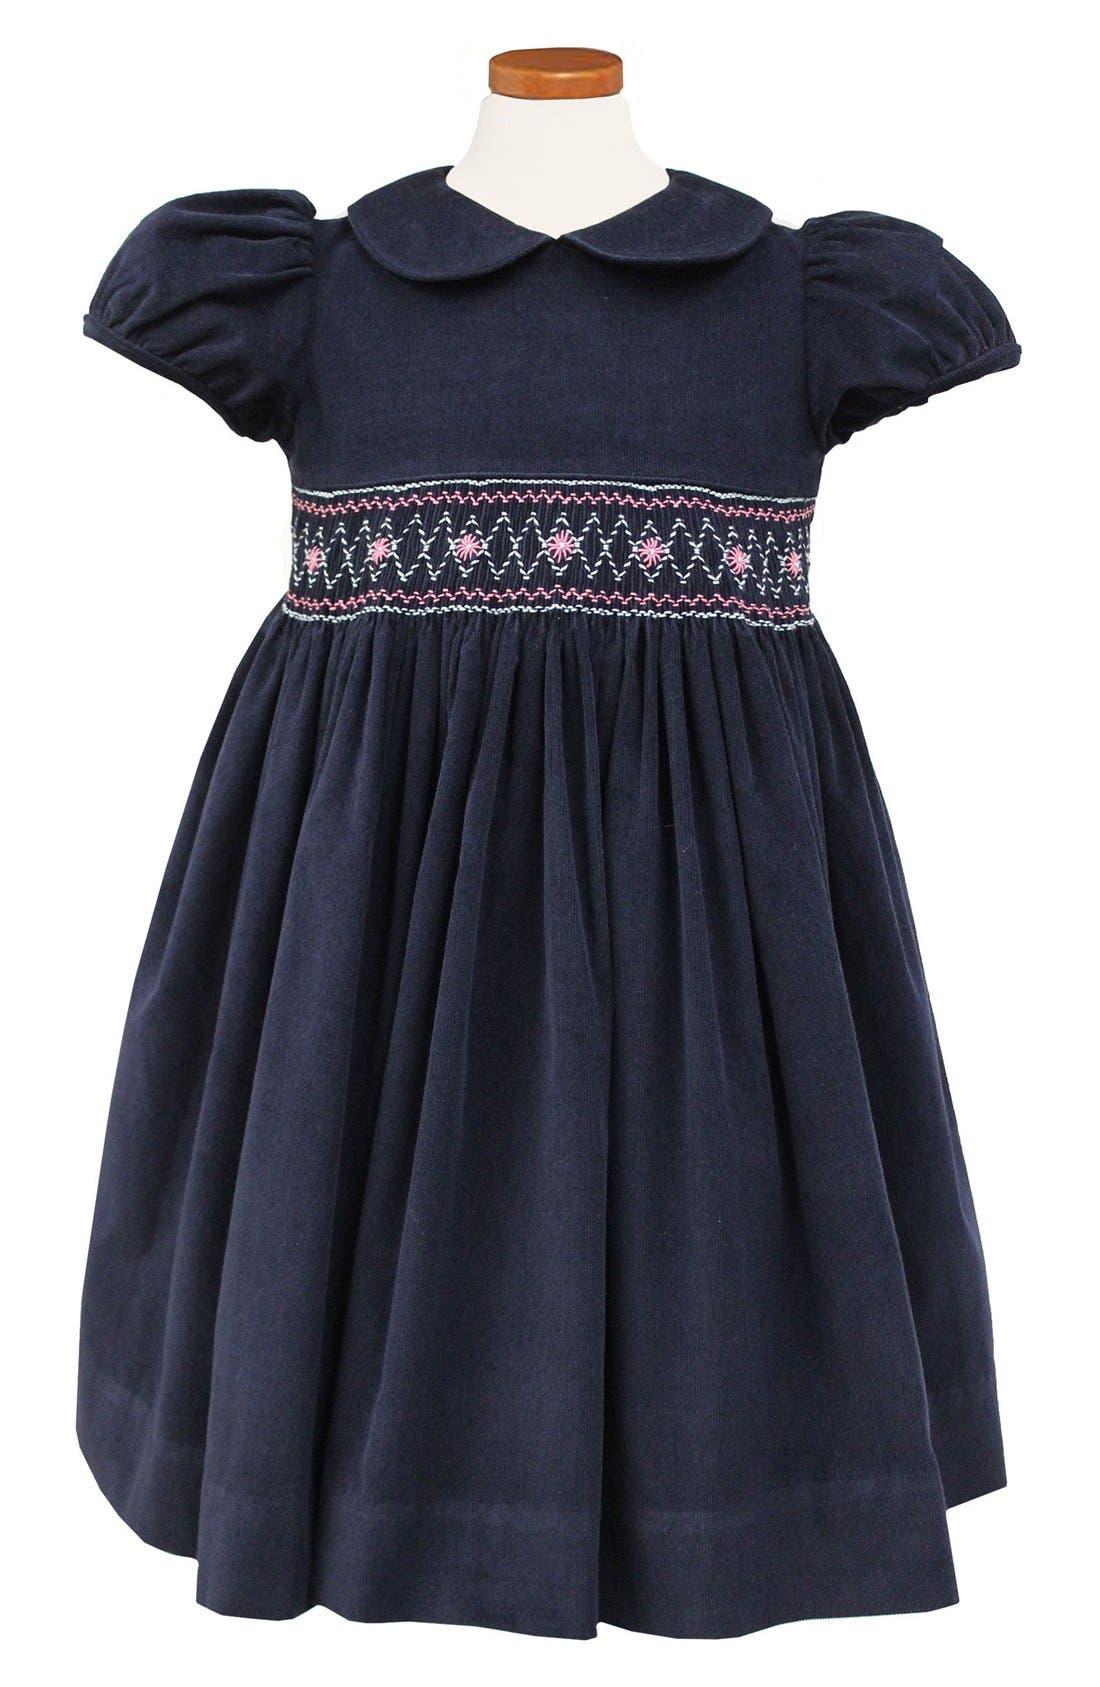 Main Image - Sorbet Embroidered Smocked Waist Dress (Toddler Girls, Little Girls & Big Girls)